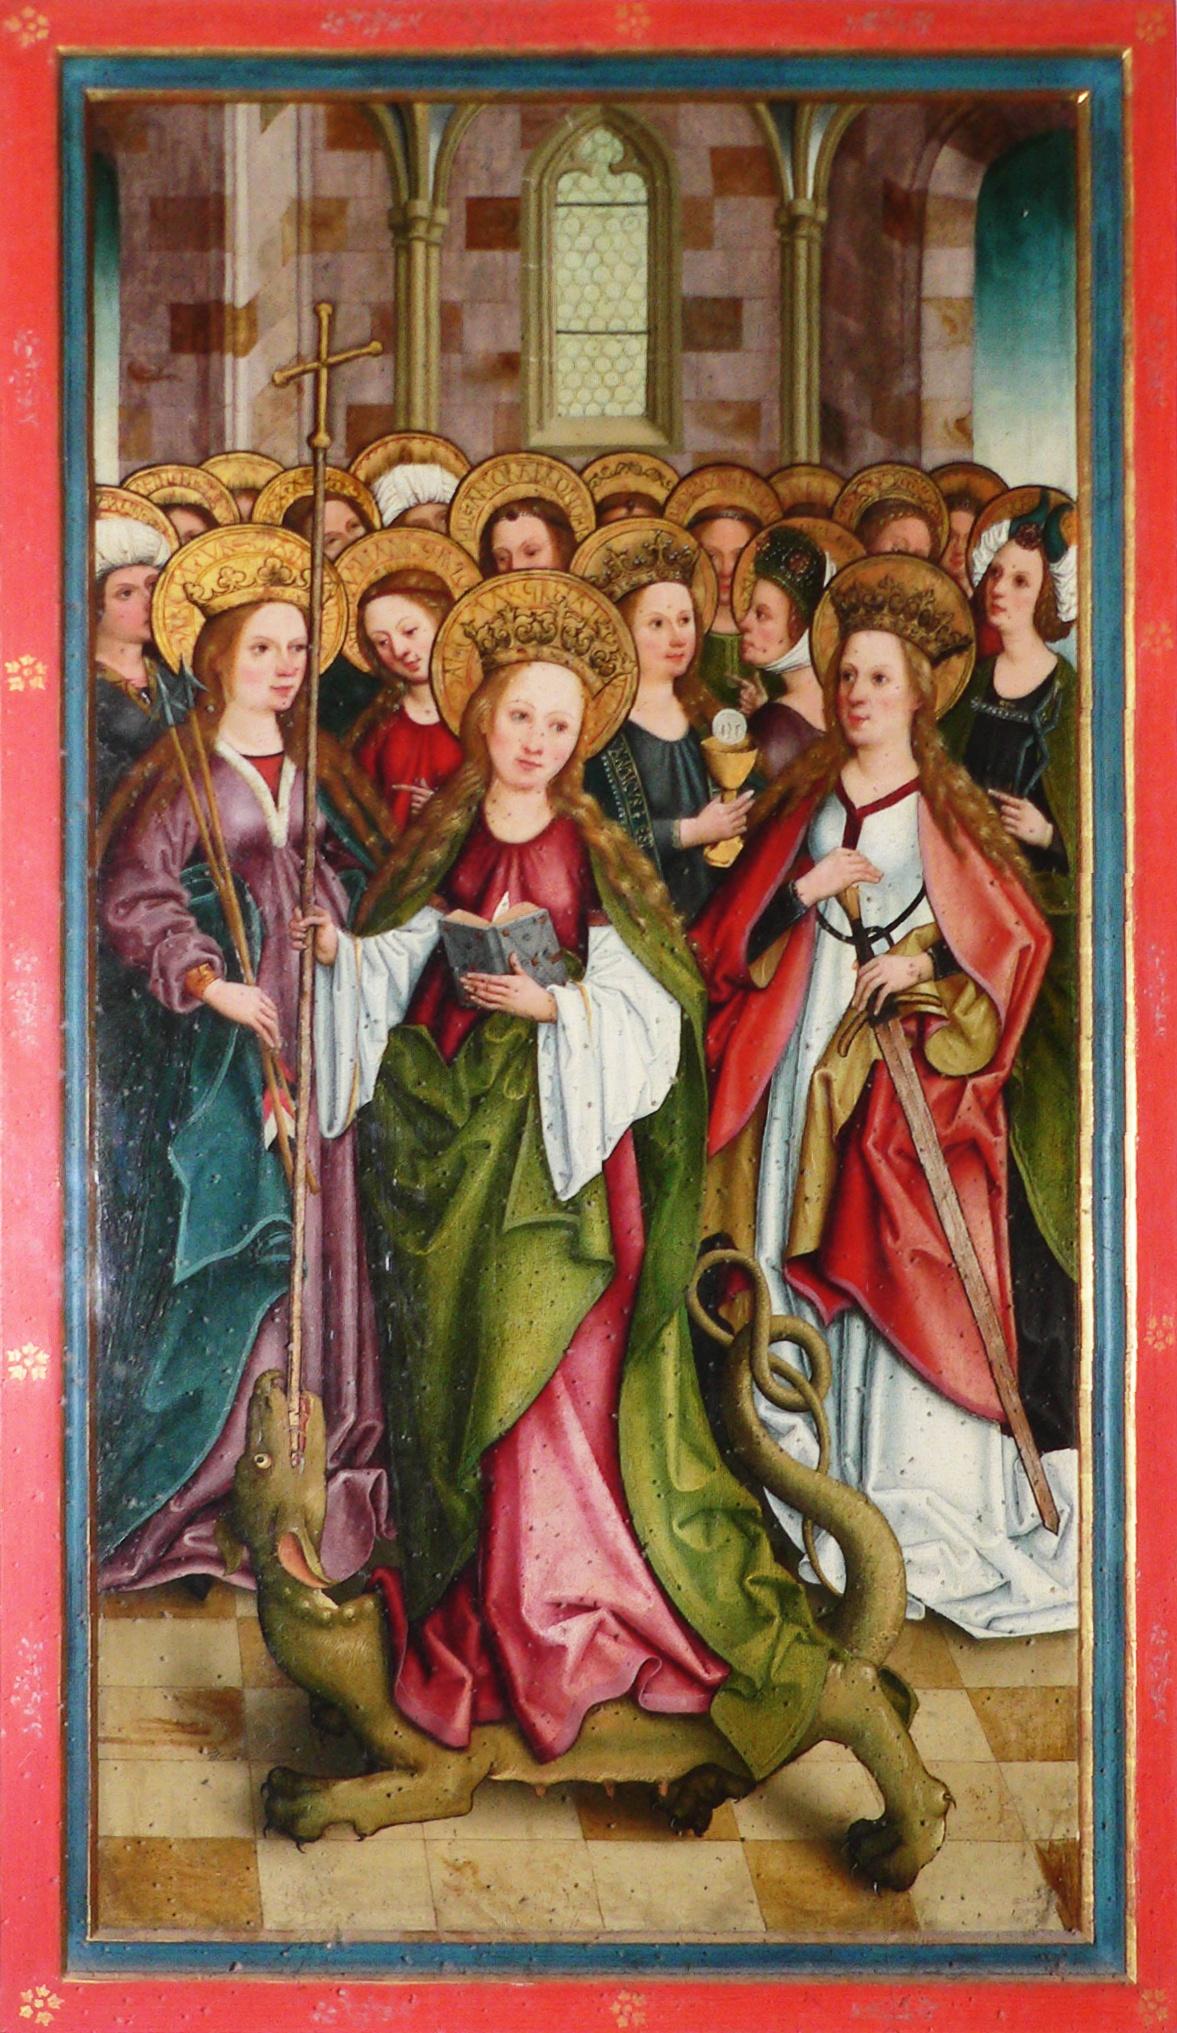 Heirat der Jungfrau, l von Raphael Raffaello Sanzio Da